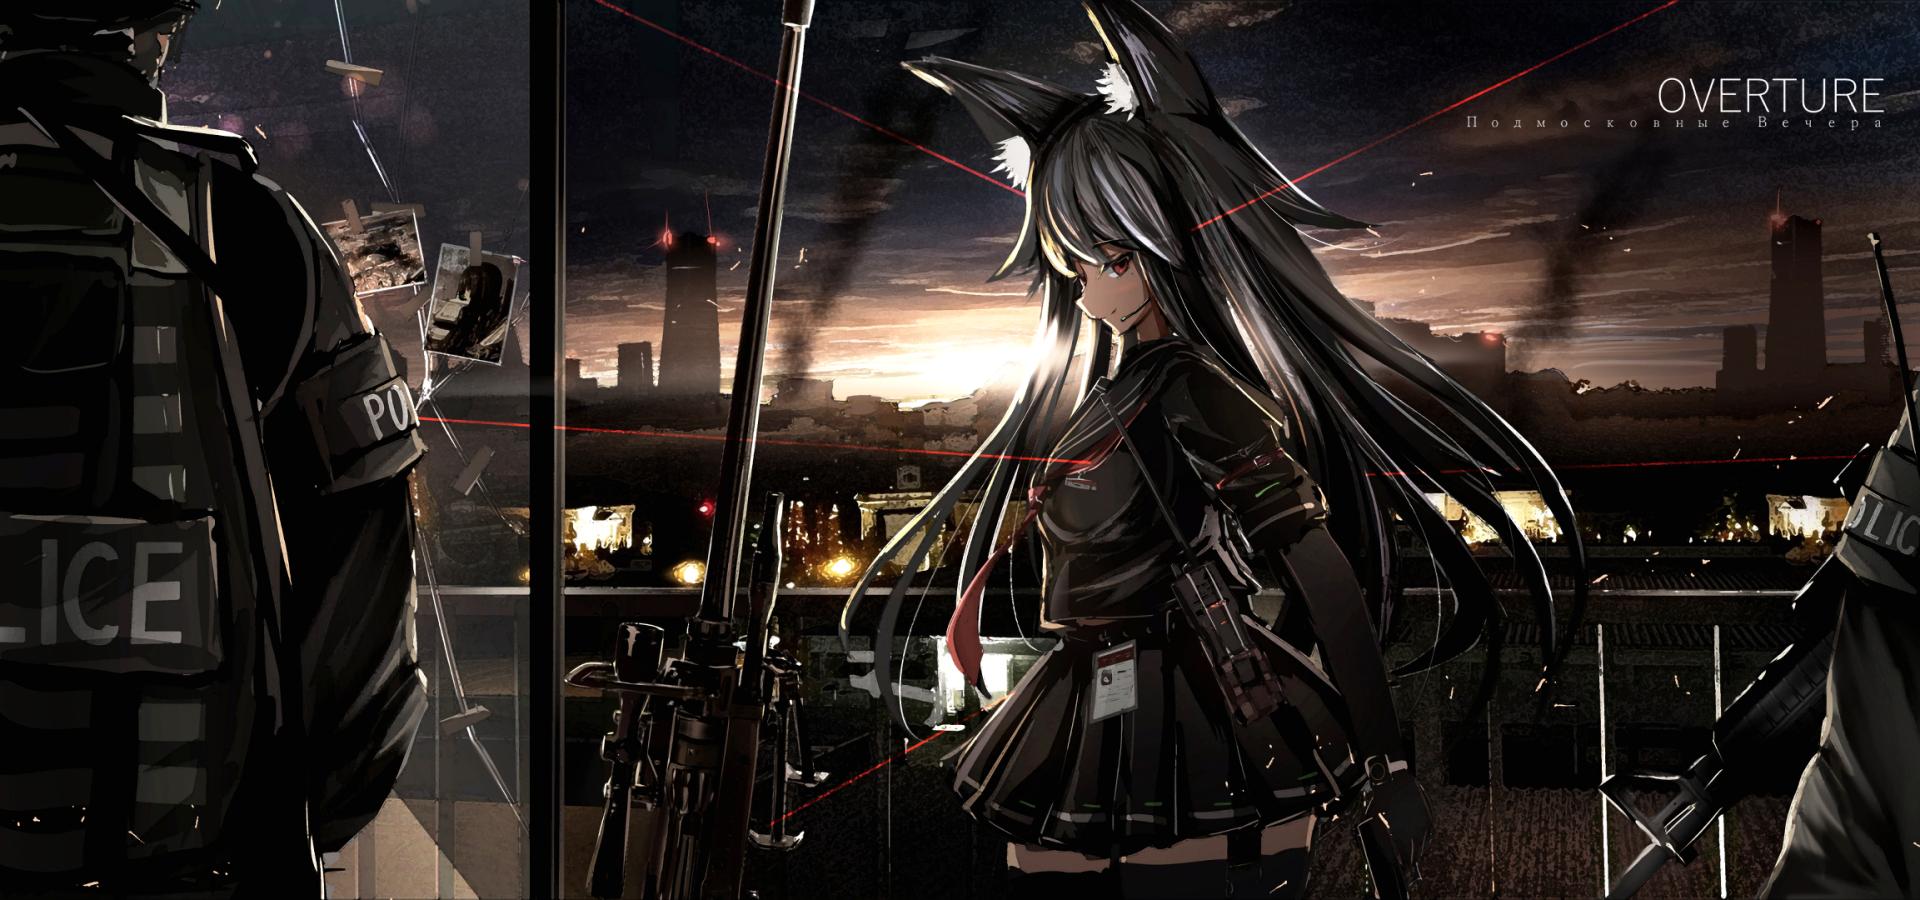 Anime - Original  Girl Police Nekomimi Gun Weapon Uniform Sniper Rifle Wallpaper